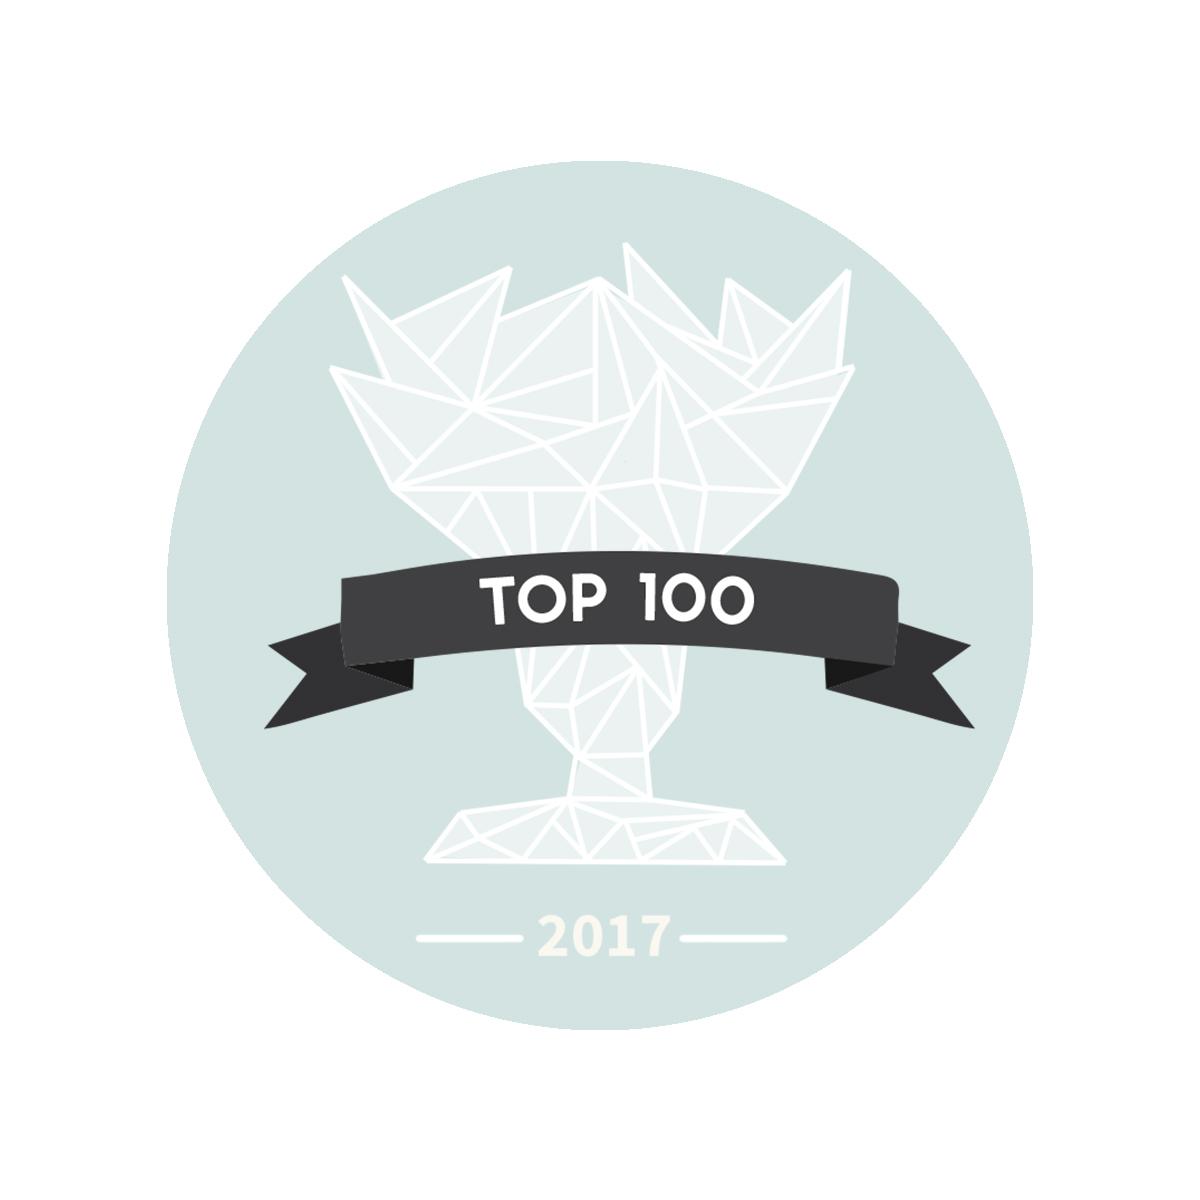 Shoot & Share Top 100 Photographer 2017